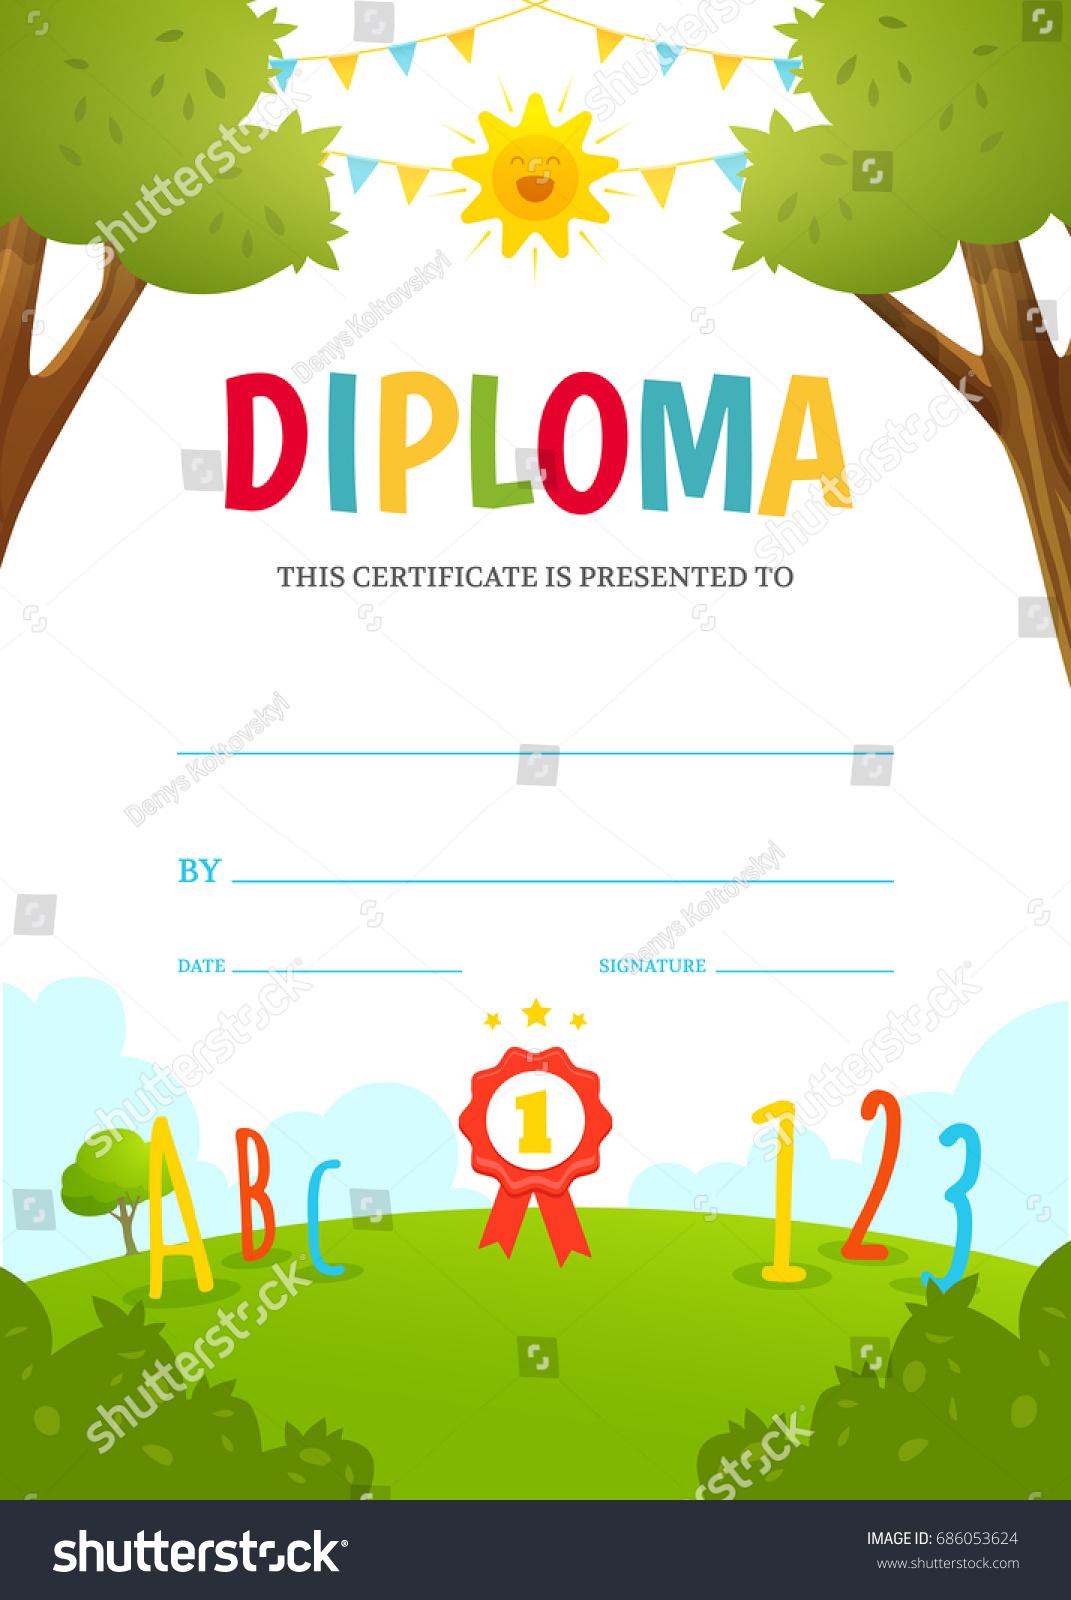 Kids diploma design template kindergarten certificate stock kids diploma design template kindergarten certificate alramifo Image collections